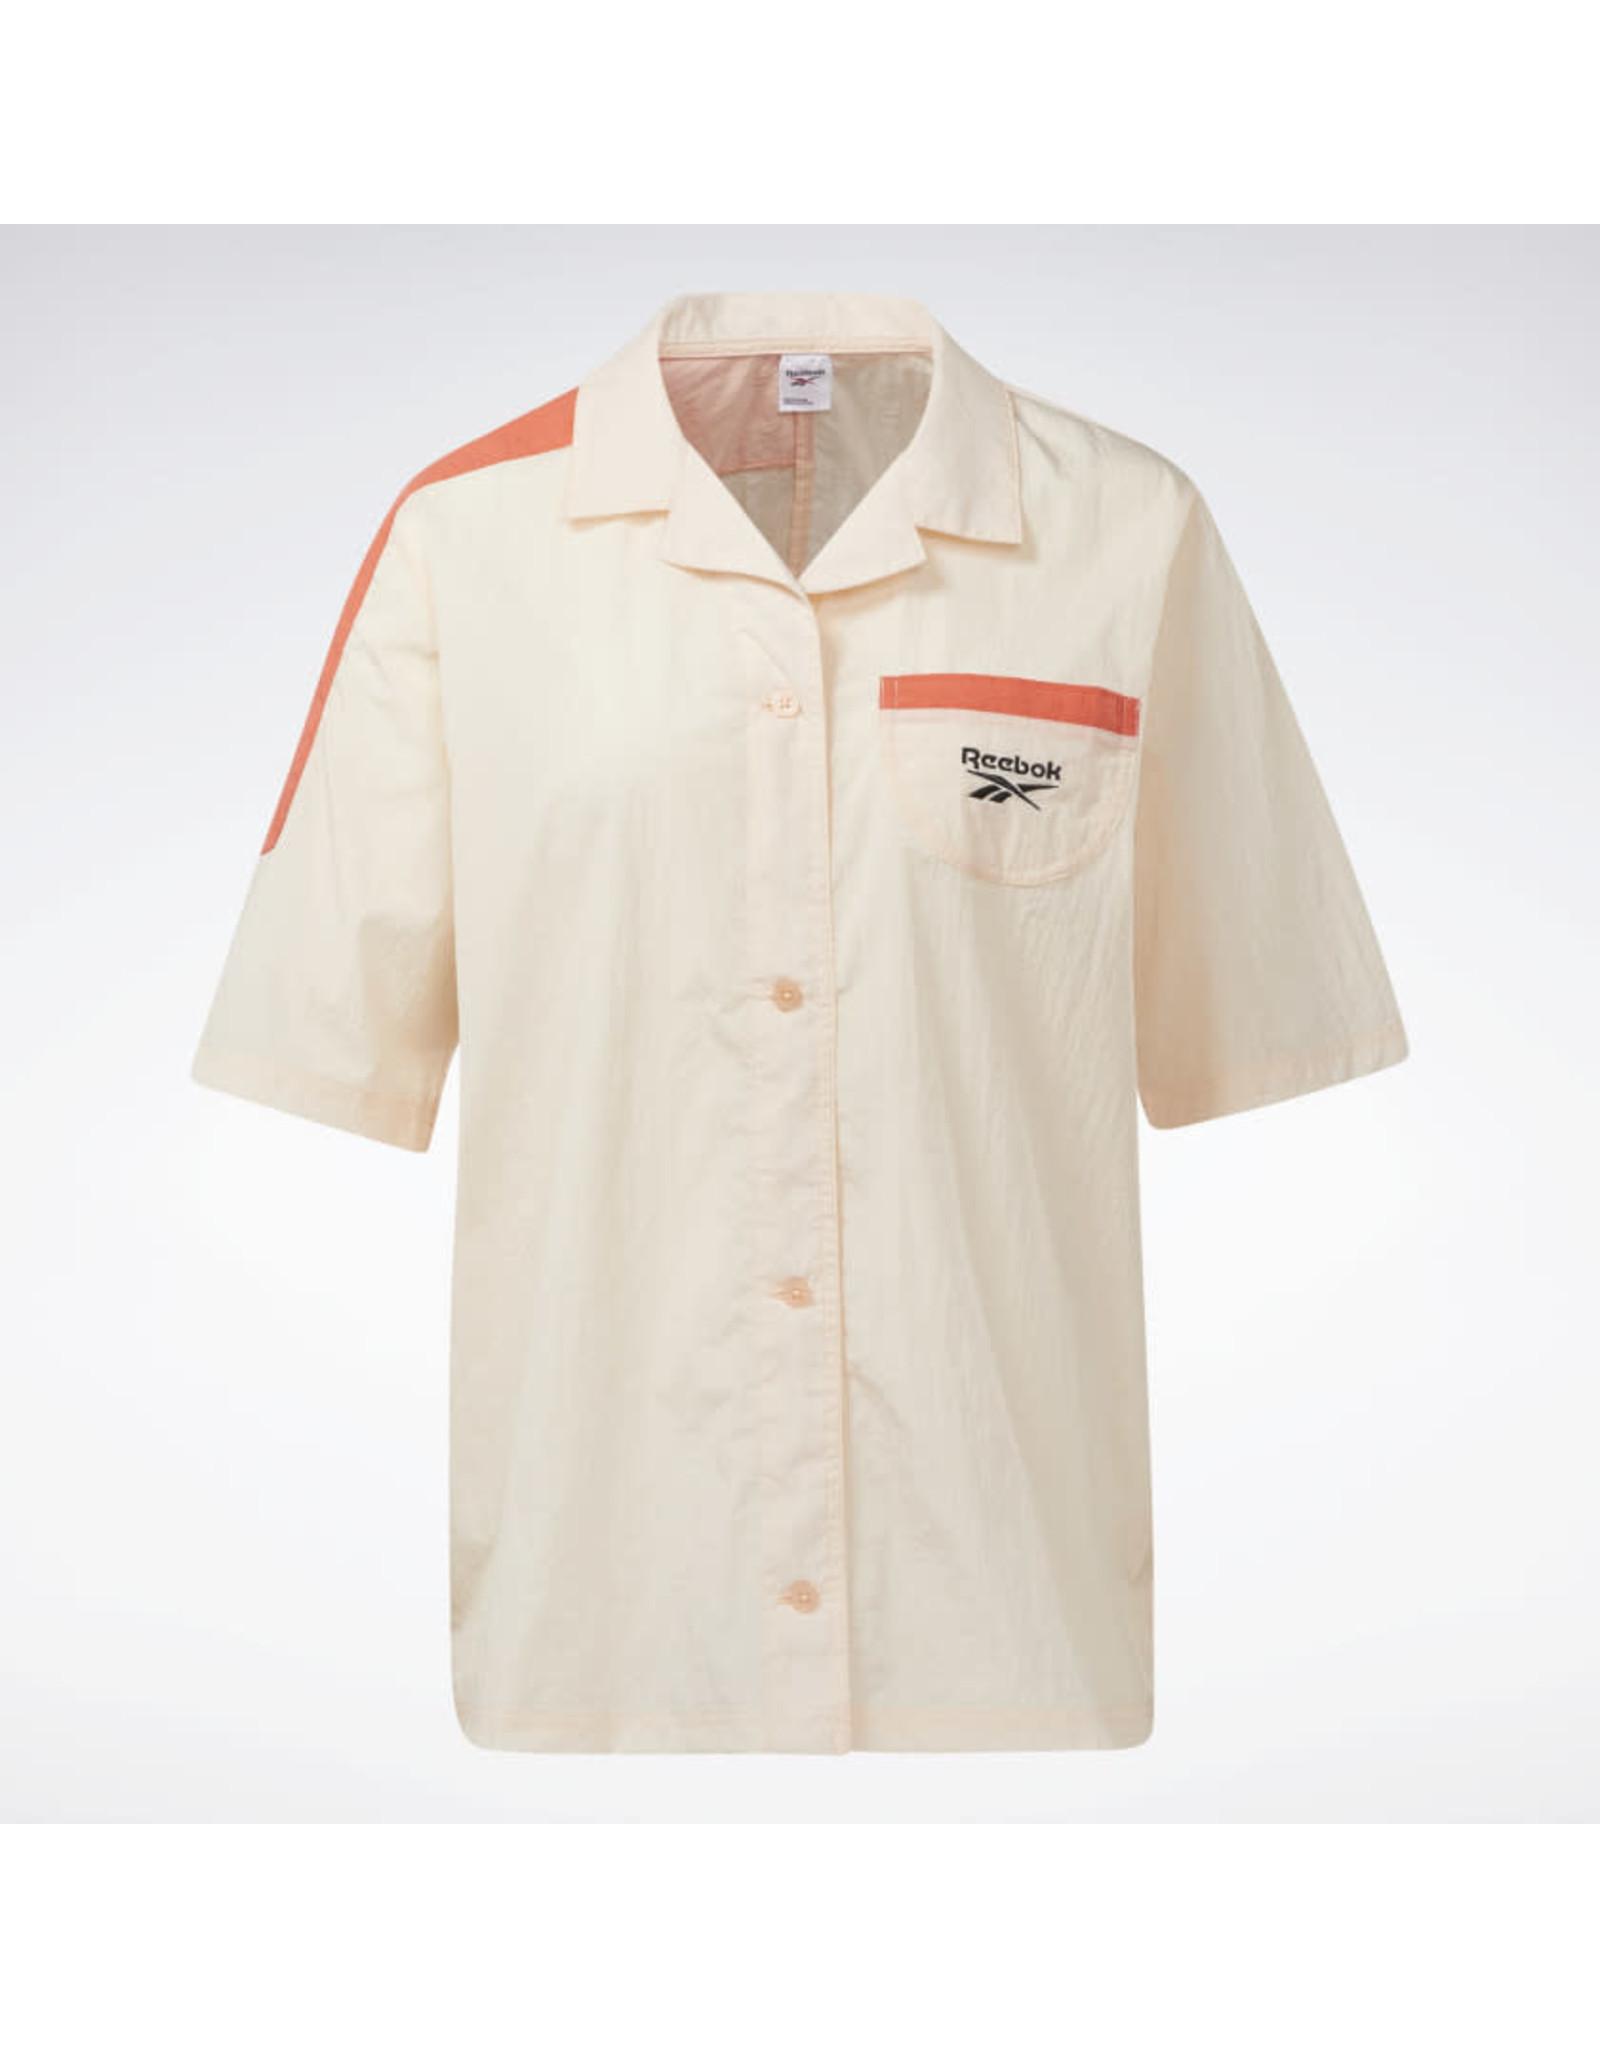 Reebok Bowling shirt